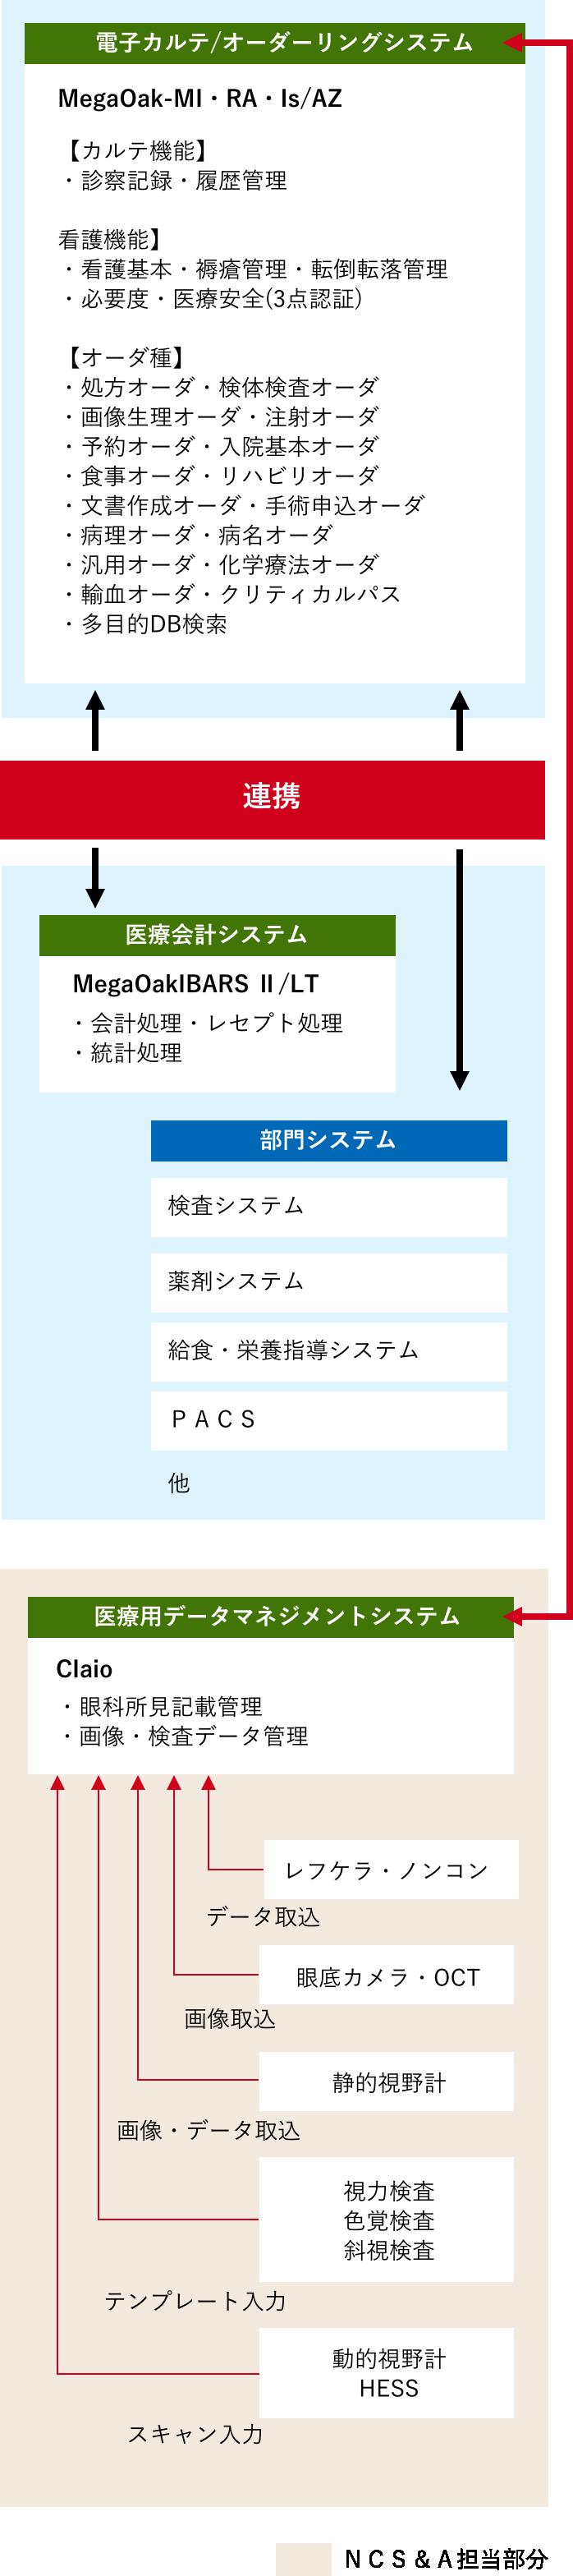 関西地区自治体病院様 導入イメージ